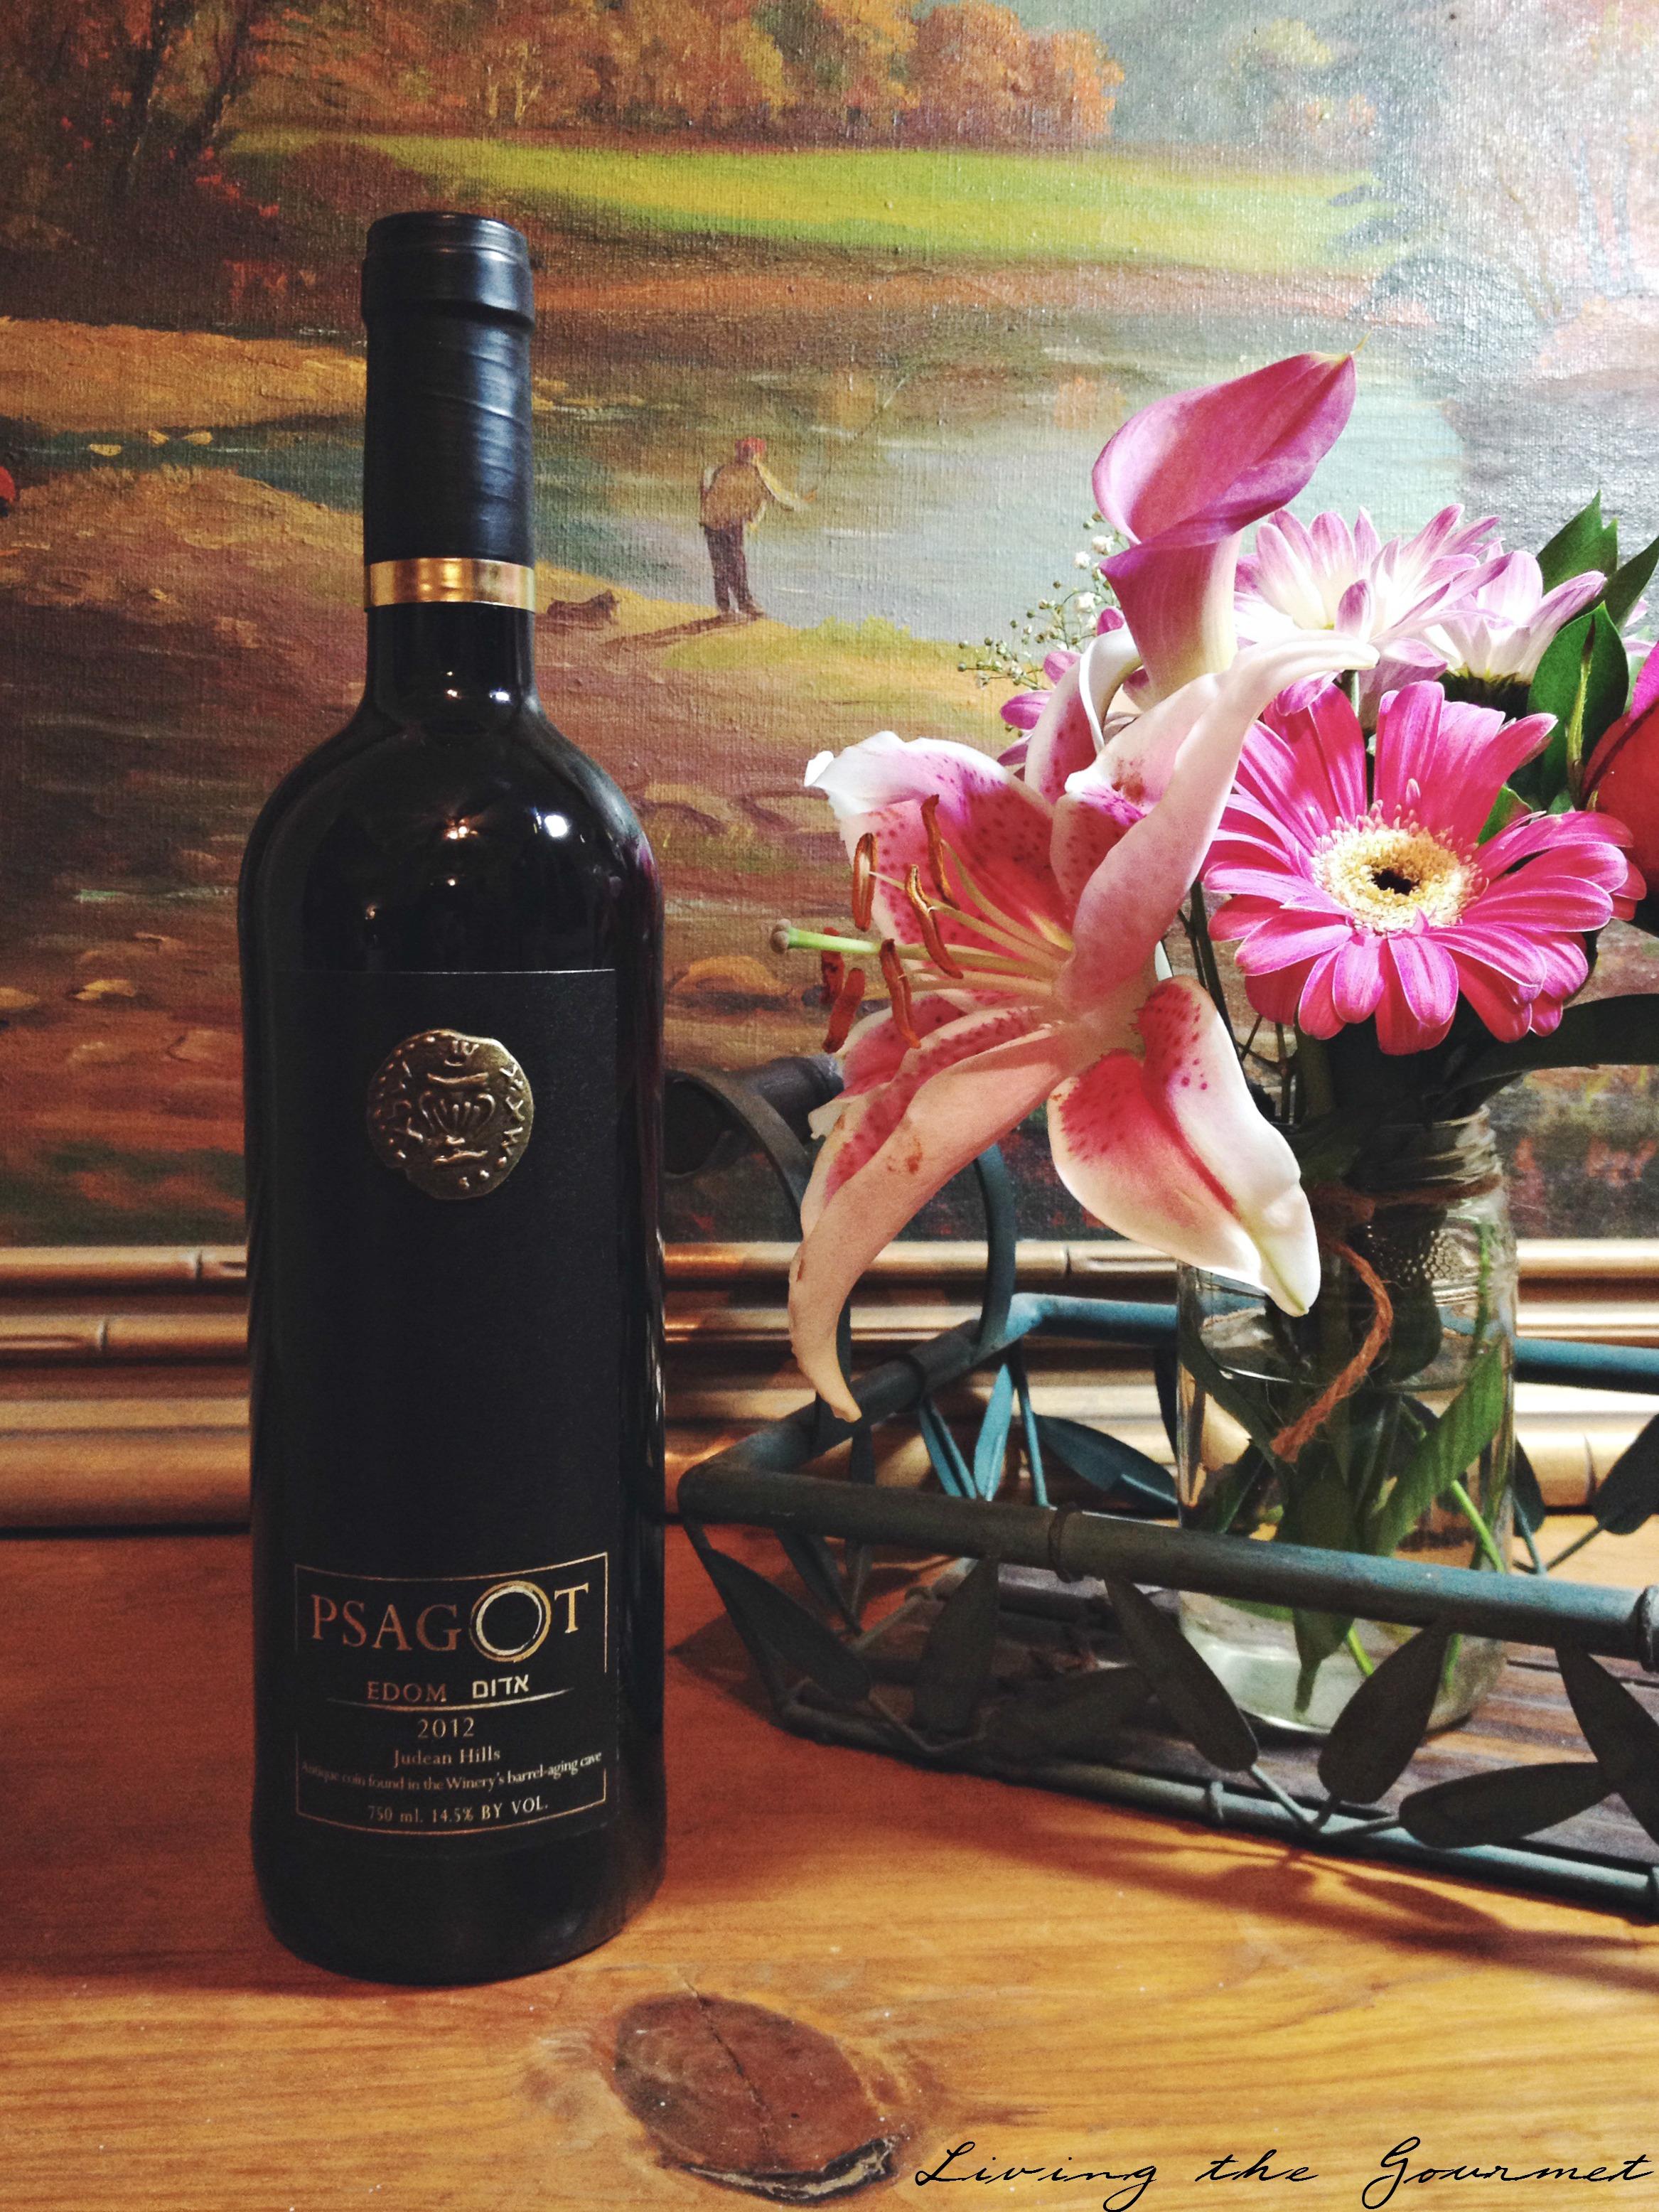 Living the Gourmet: Psagot's Edom   #WineWeek #LTG